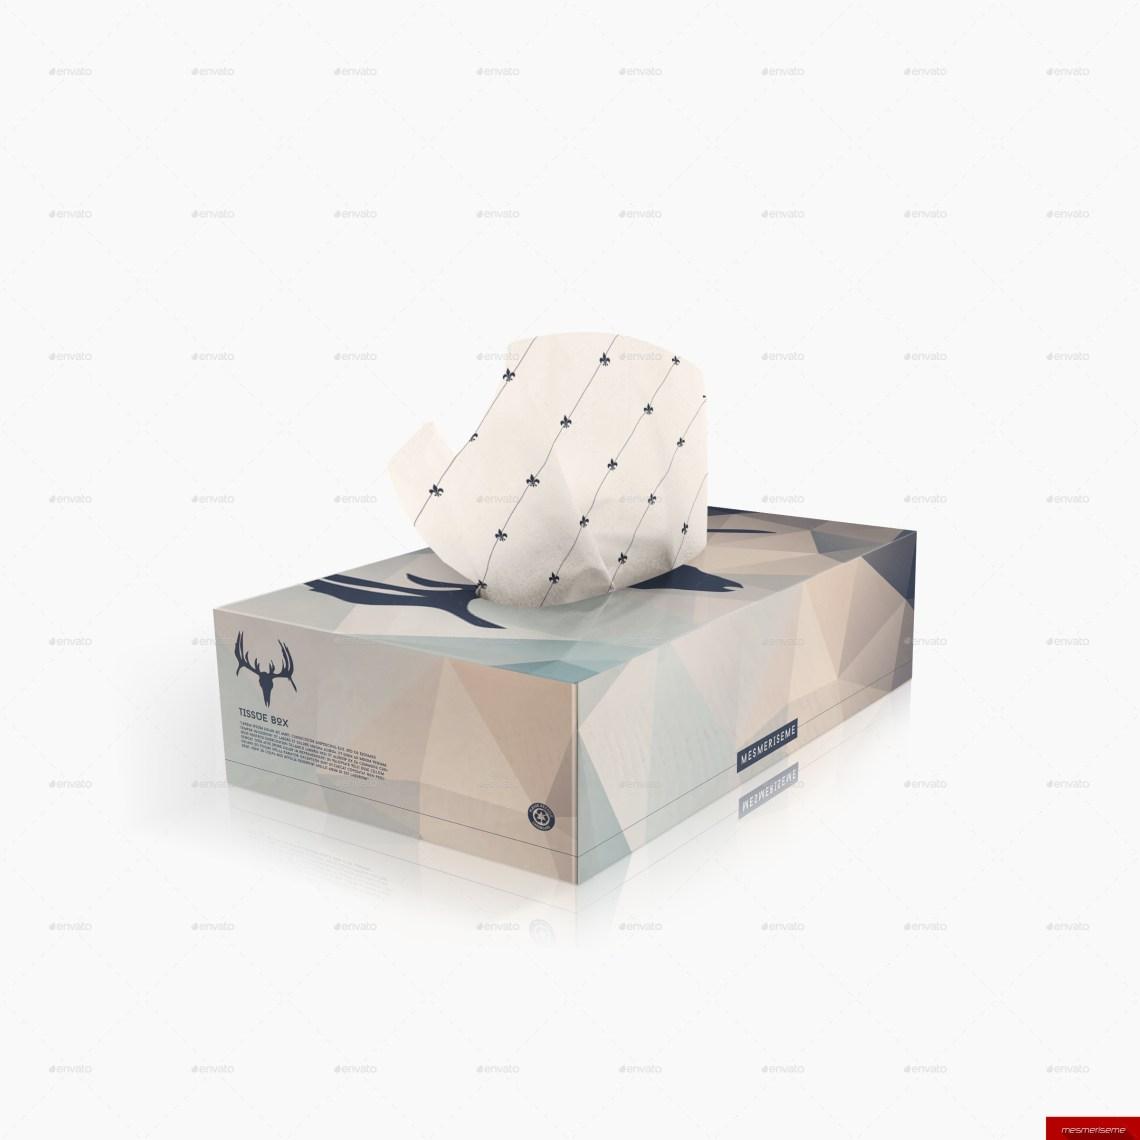 Download 2x Tissue Box Mock-up by mesmeriseme_pro | GraphicRiver